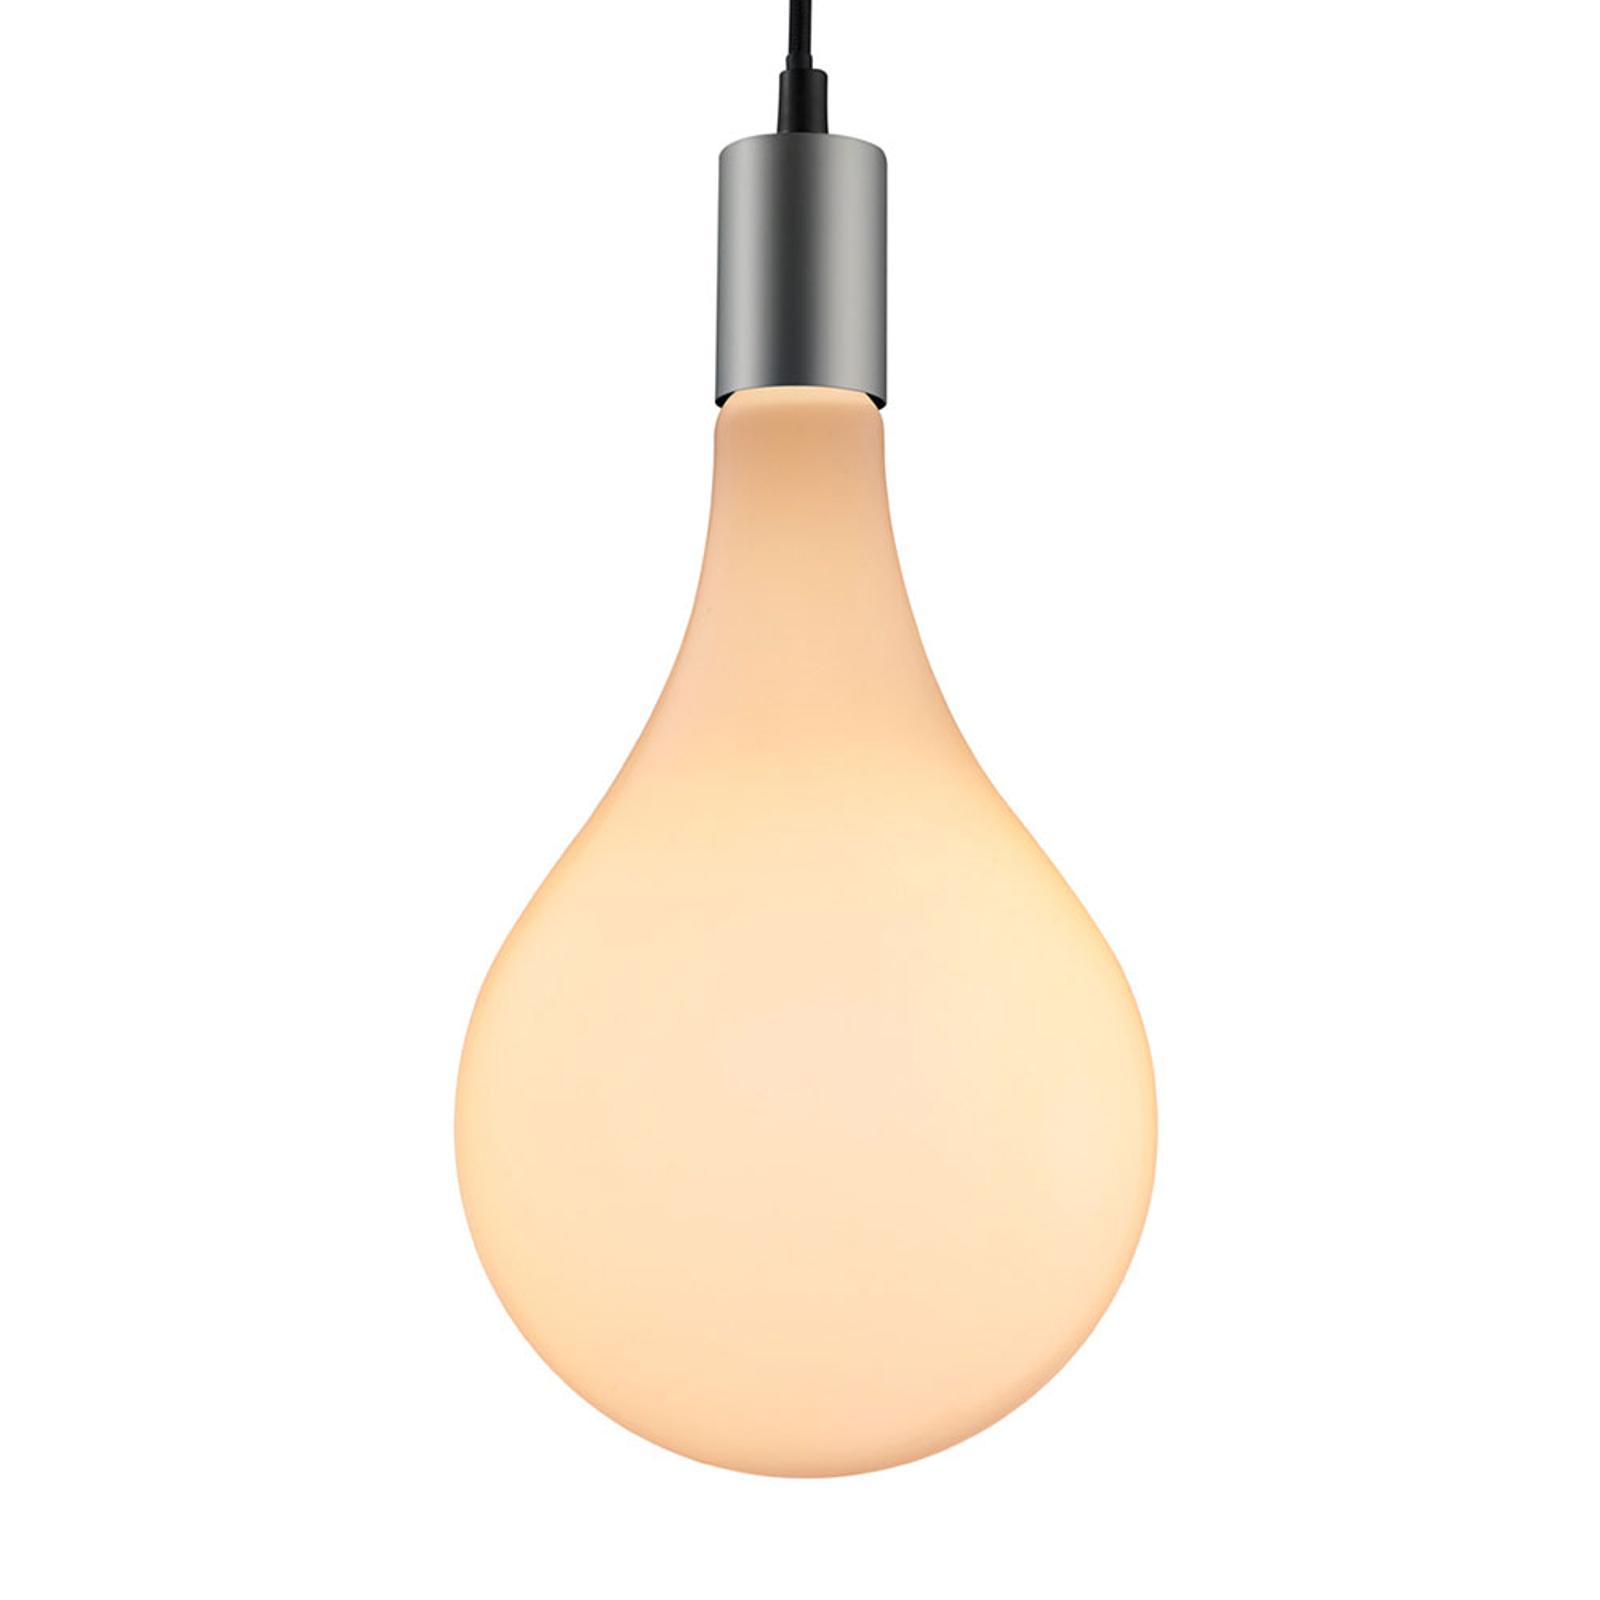 WiZ E27 Giant LED-dropplampa 6,5 W dim CCT matt